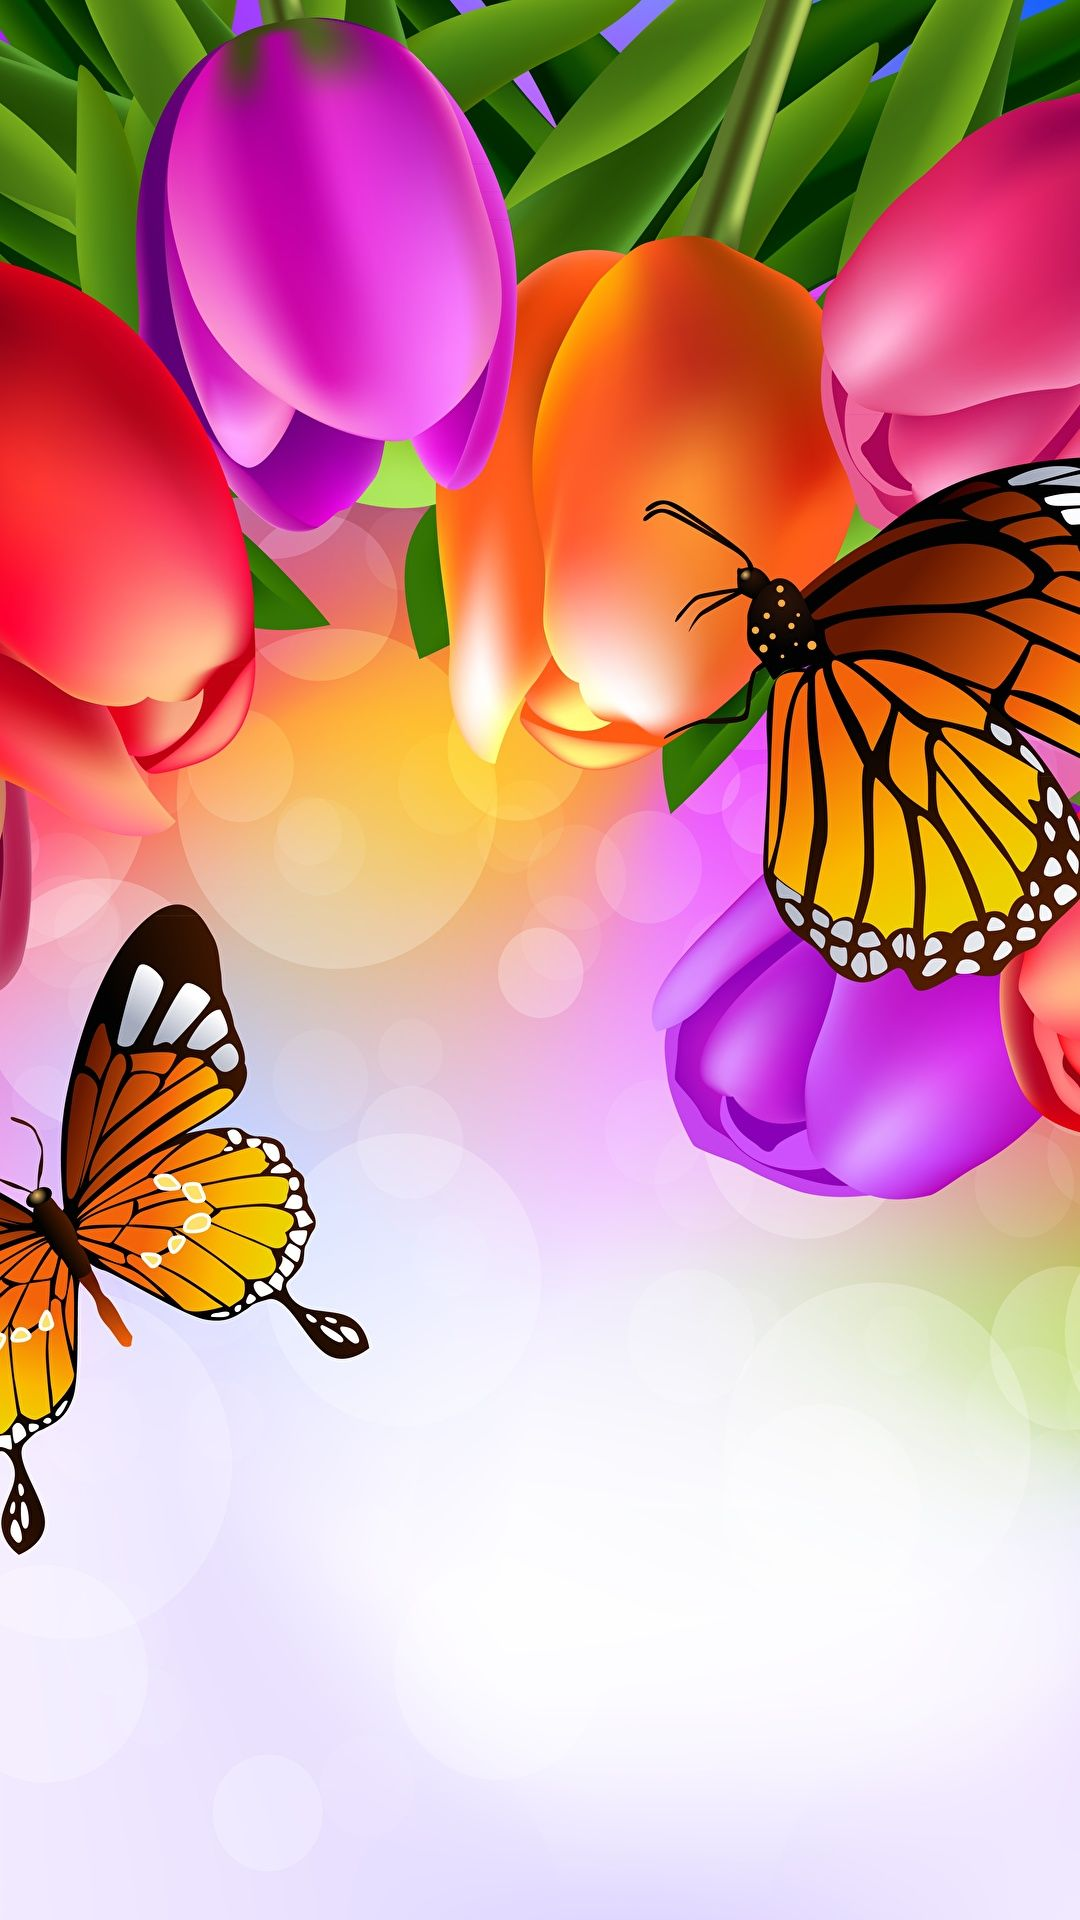 Butterflies Tulips Monarch Butterfly Animals Photo Wallpaper Imag